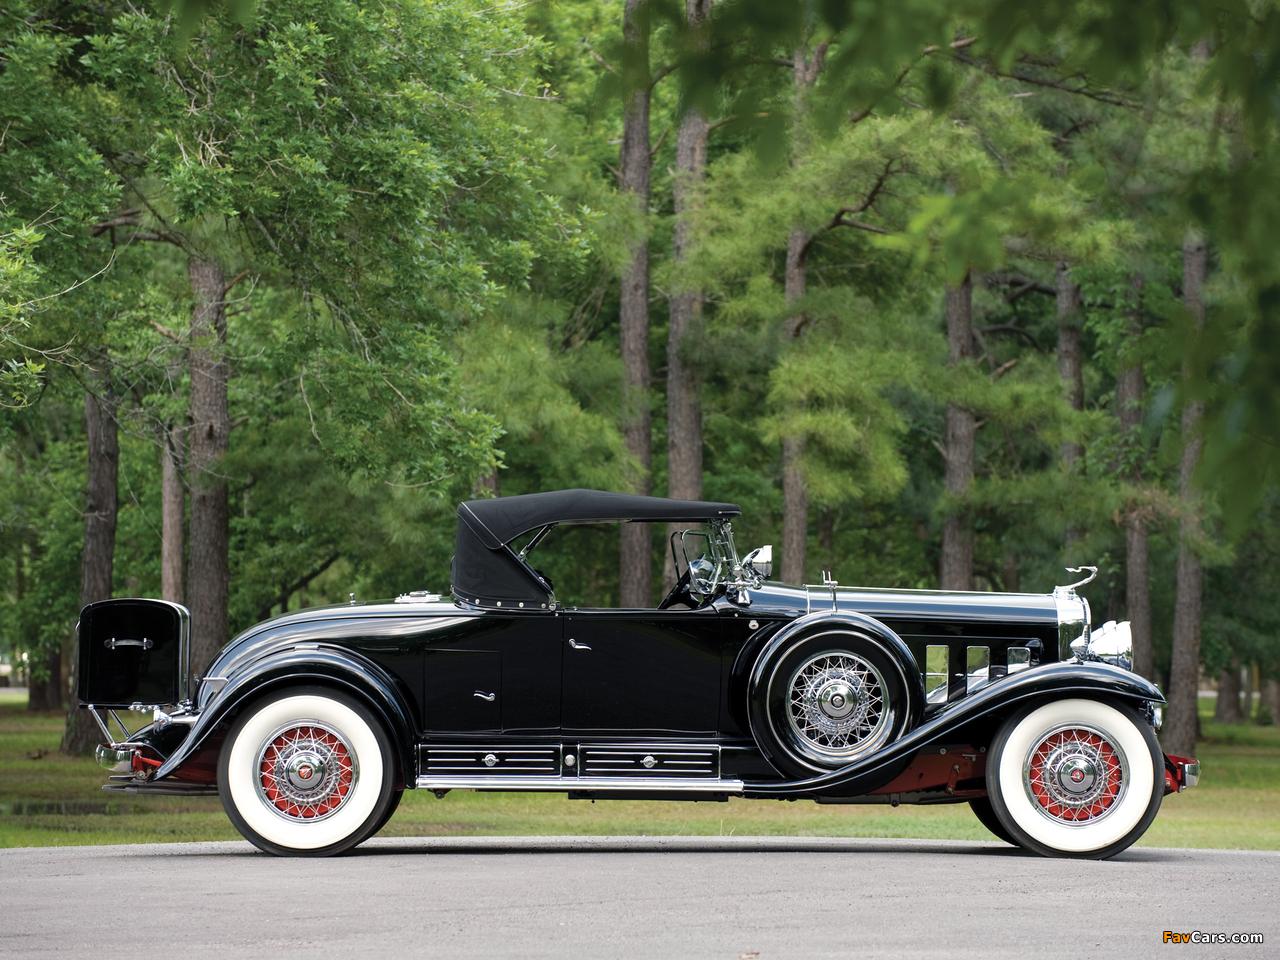 Cadillac V16 452 Roadster 1930 photos (1280 x 960)